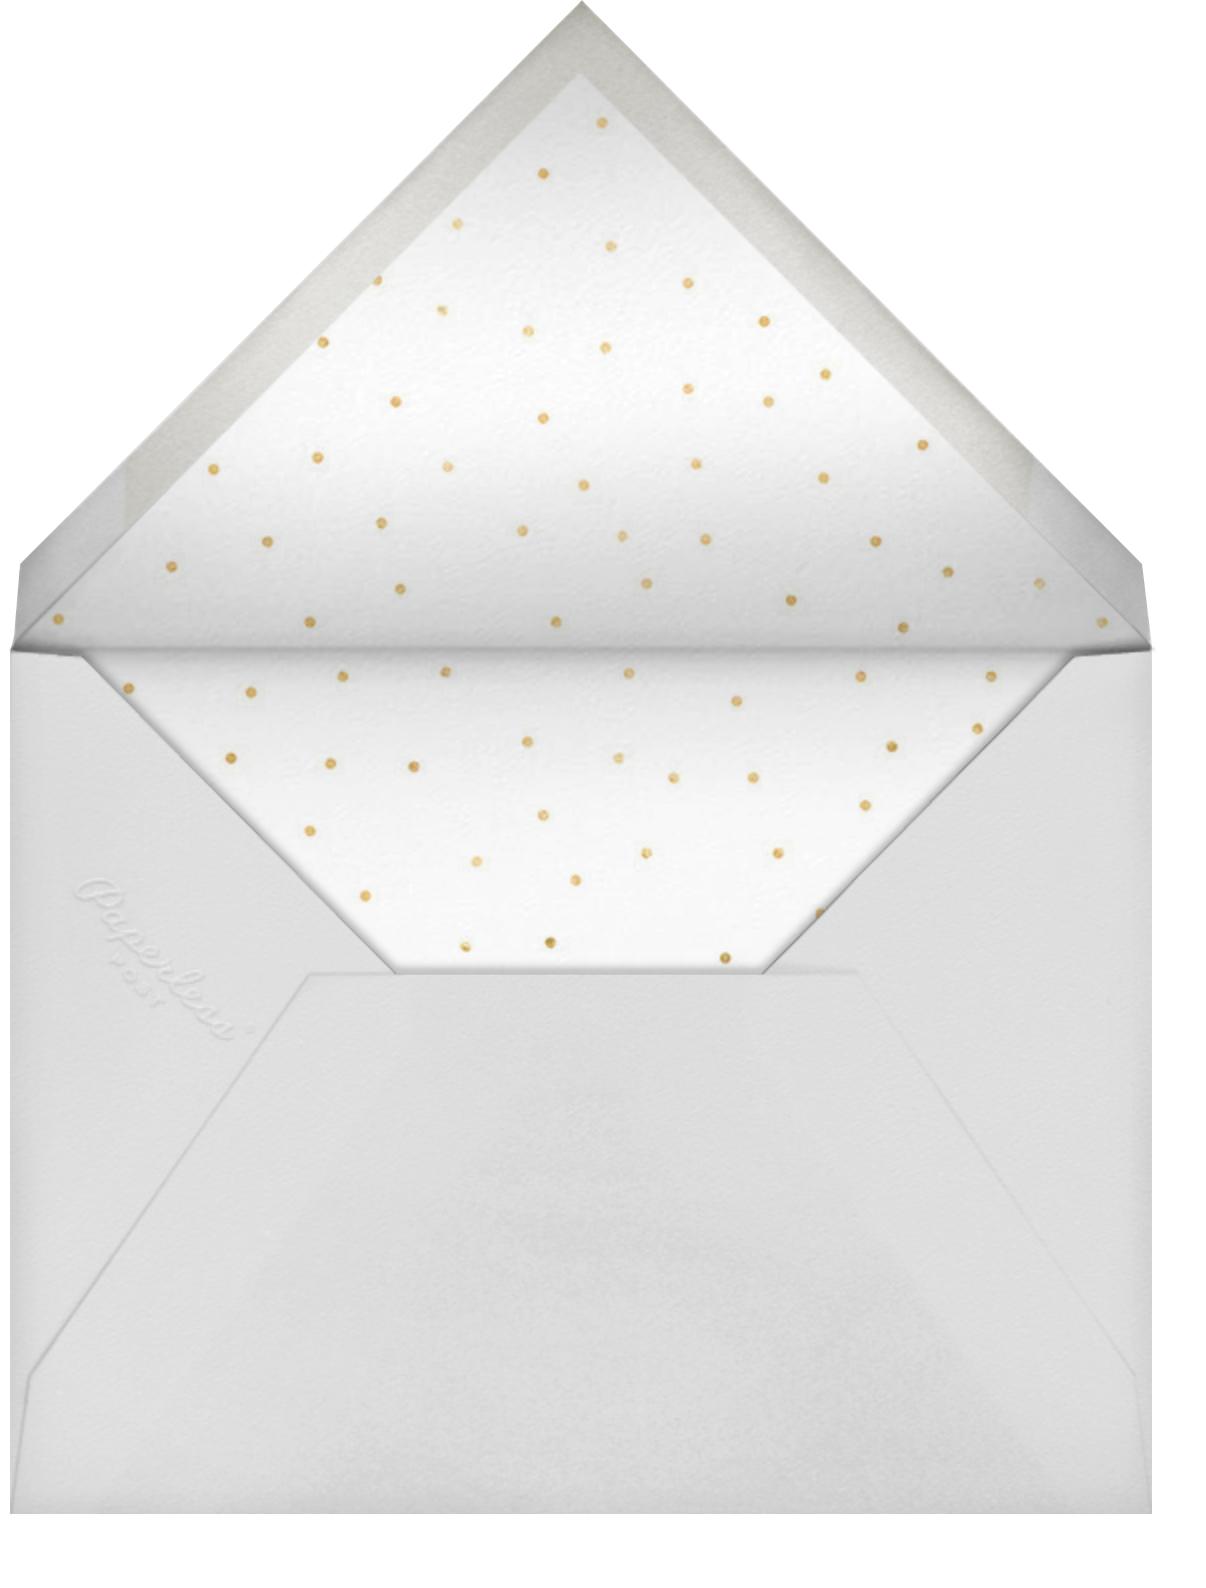 Cursive and Confetti - Sugar Paper - Bridal shower - envelope back